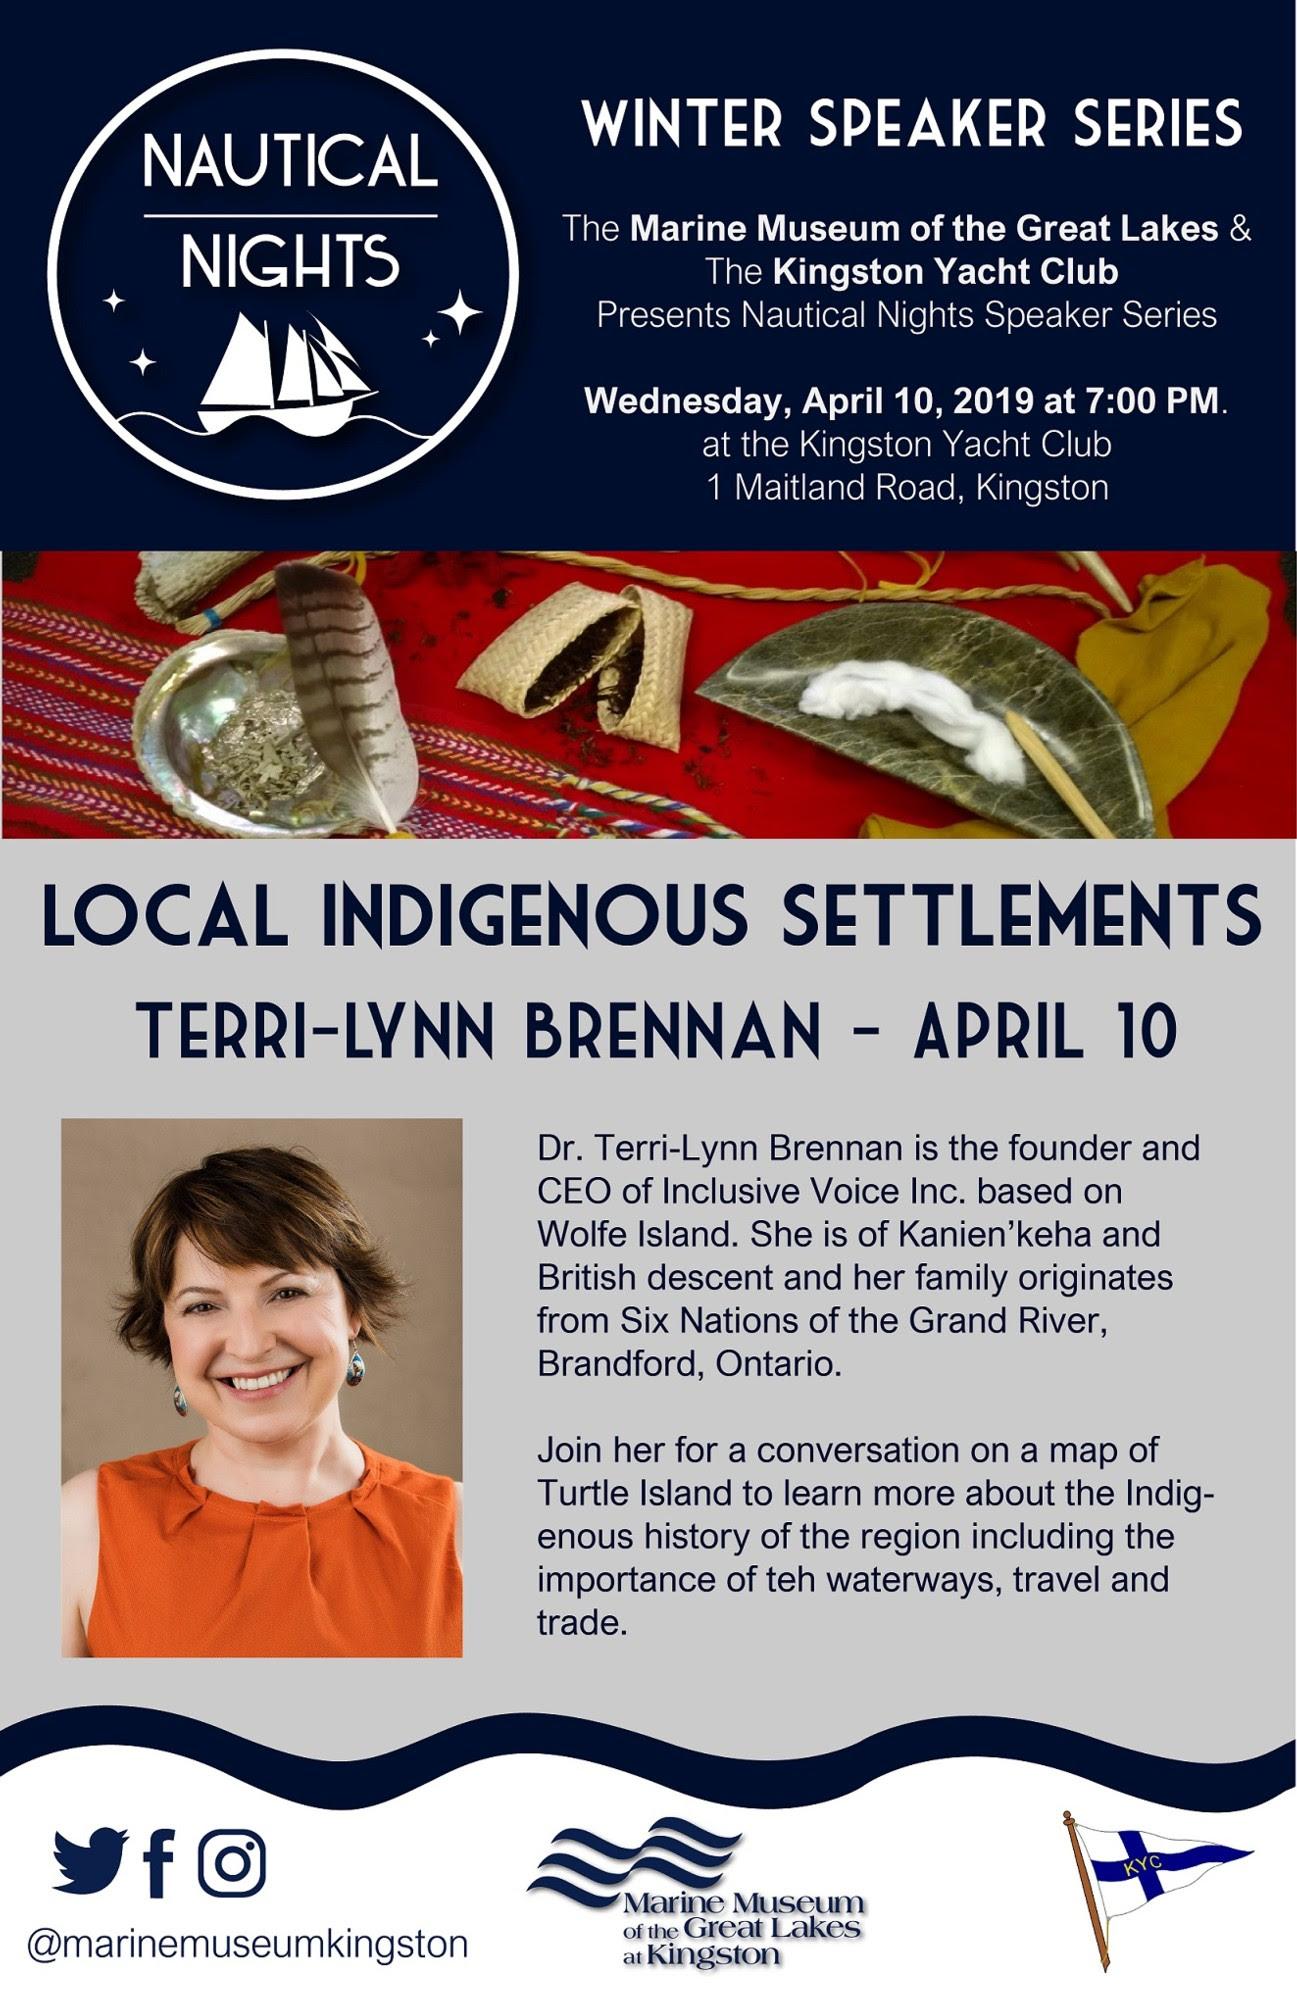 Local Indigenous Settlements